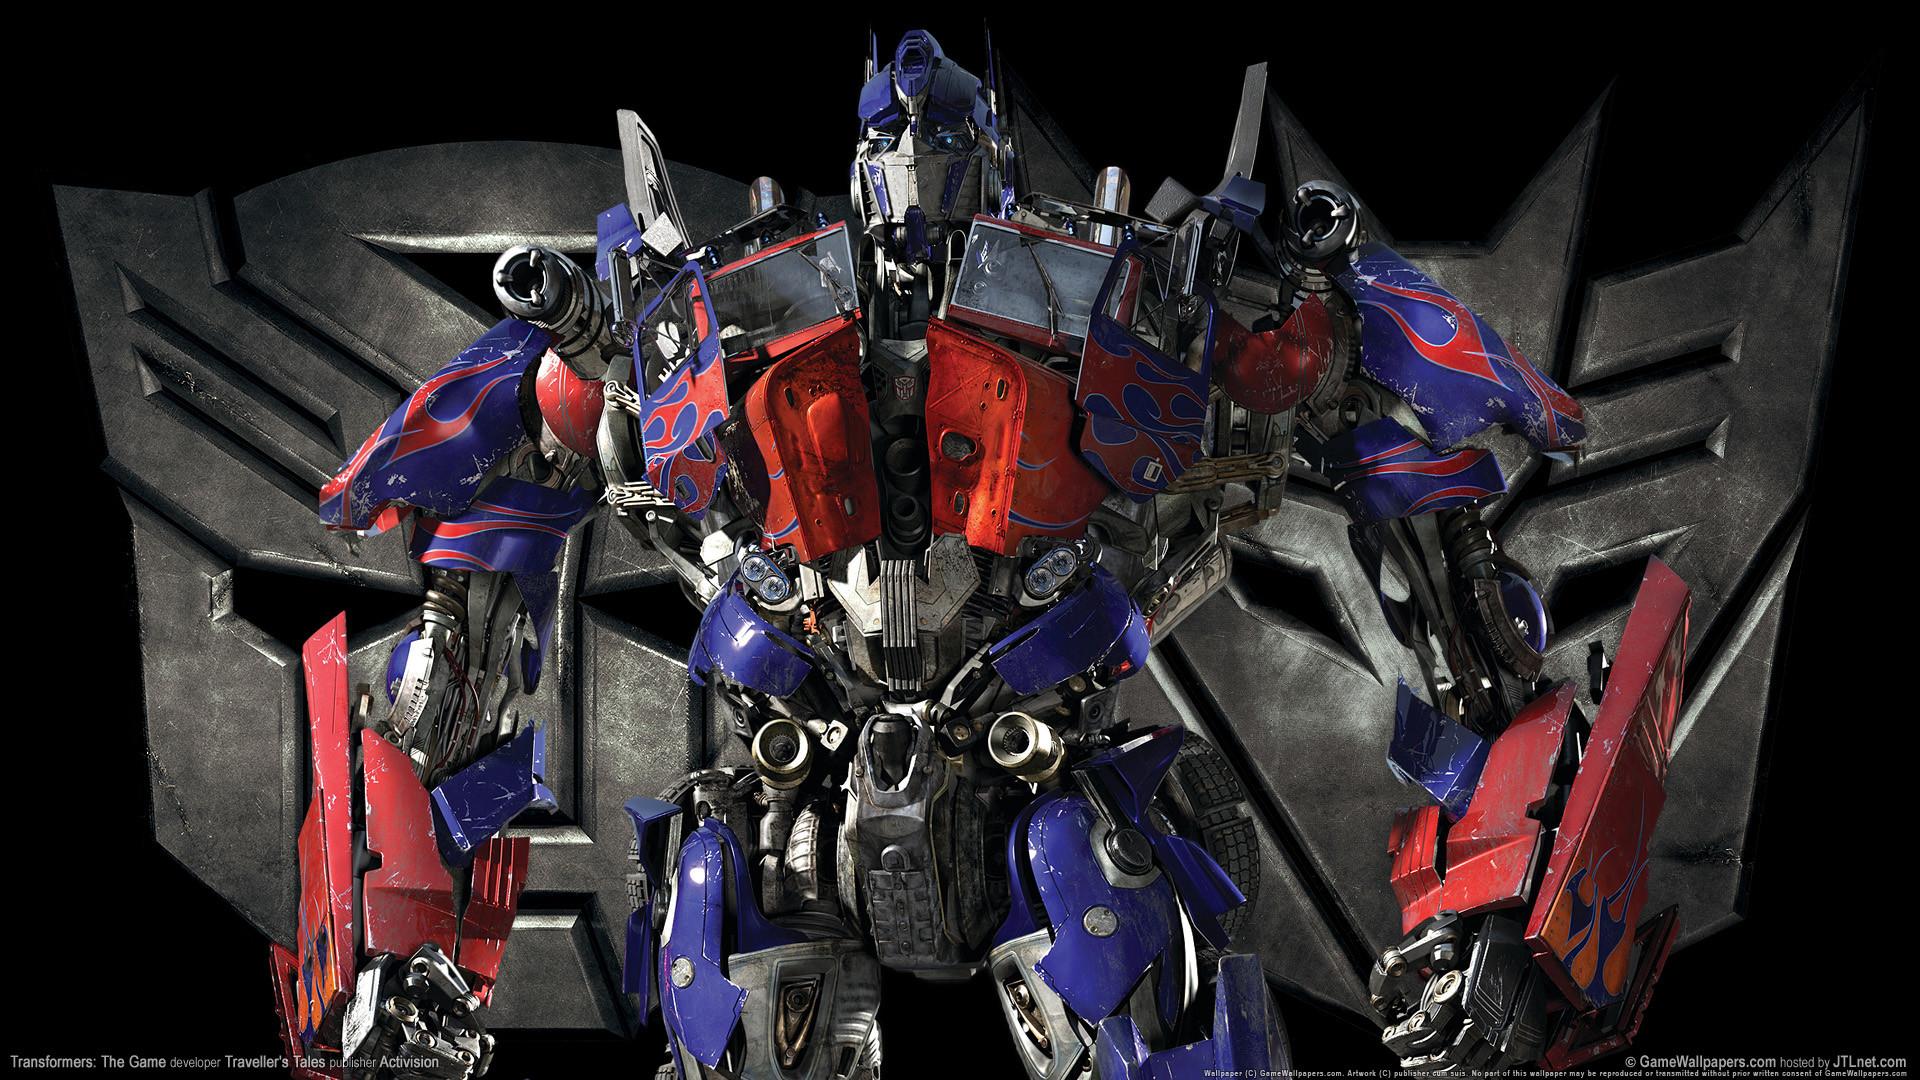 Transformers Optimus Prime Game Wallpapers | HD Wallpapers